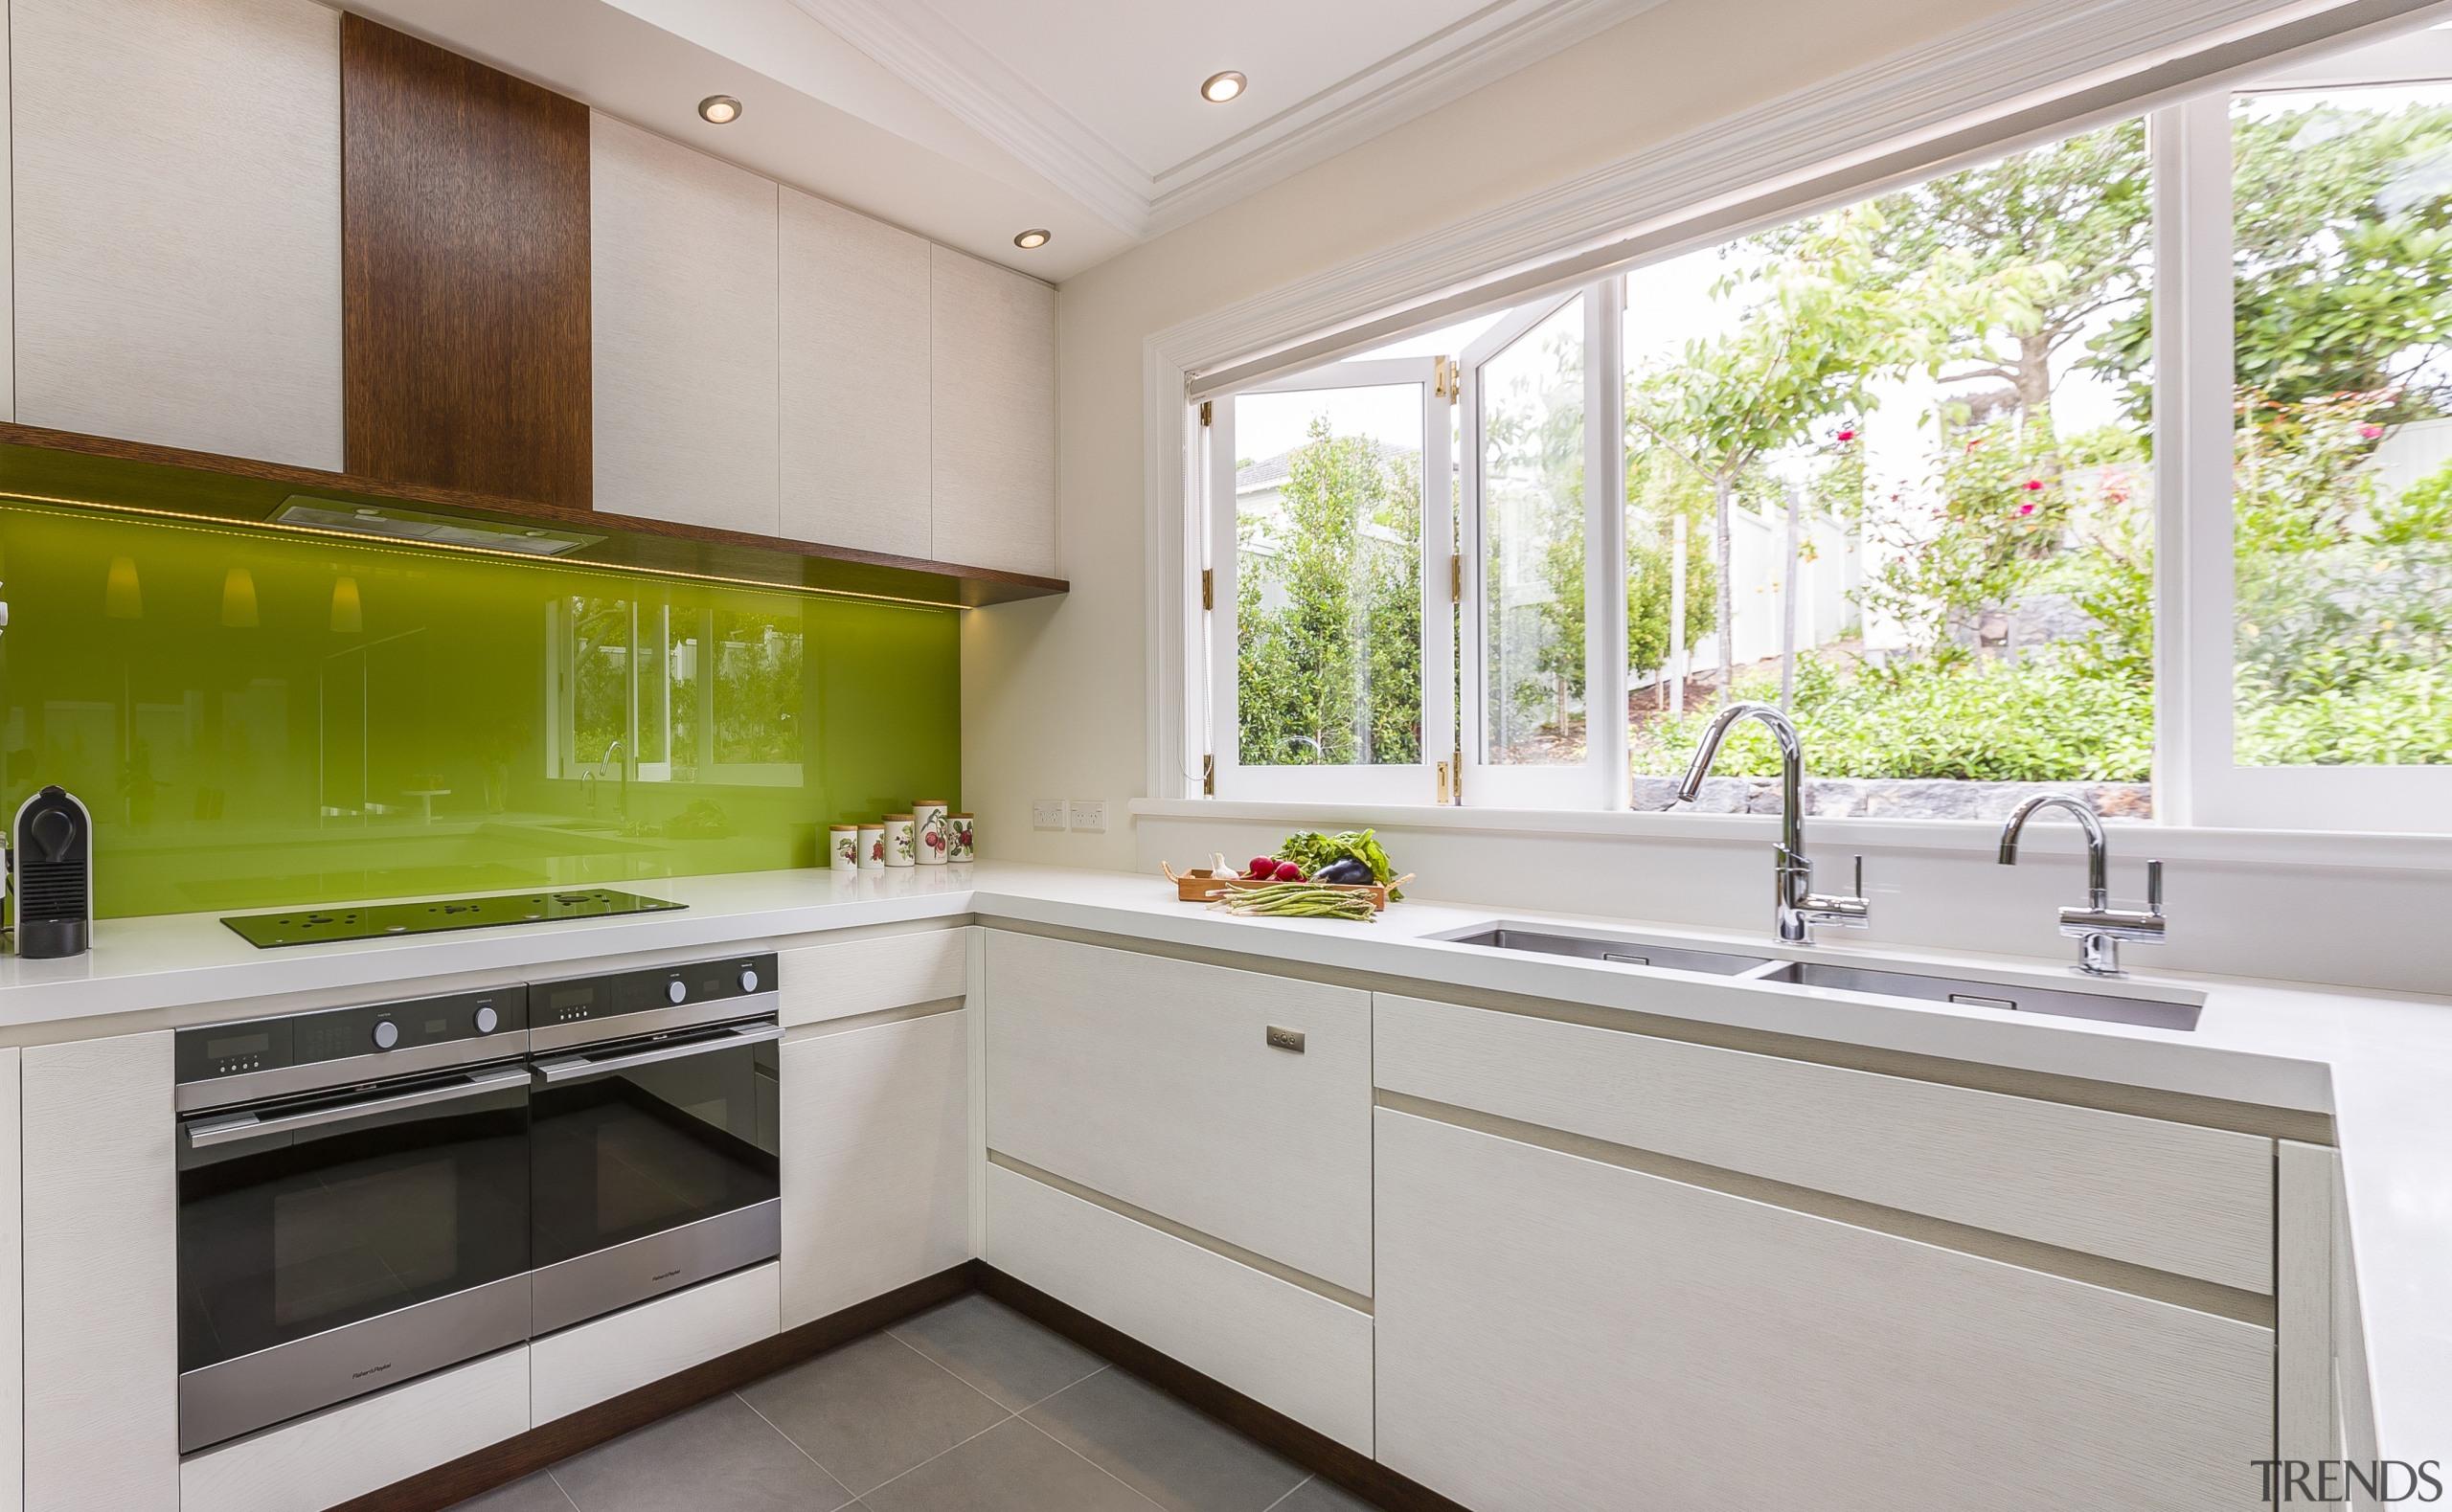 Multifuction oven - Multifuction oven - countertop   countertop, cuisine classique, interior design, kitchen, property, real estate, window, gray